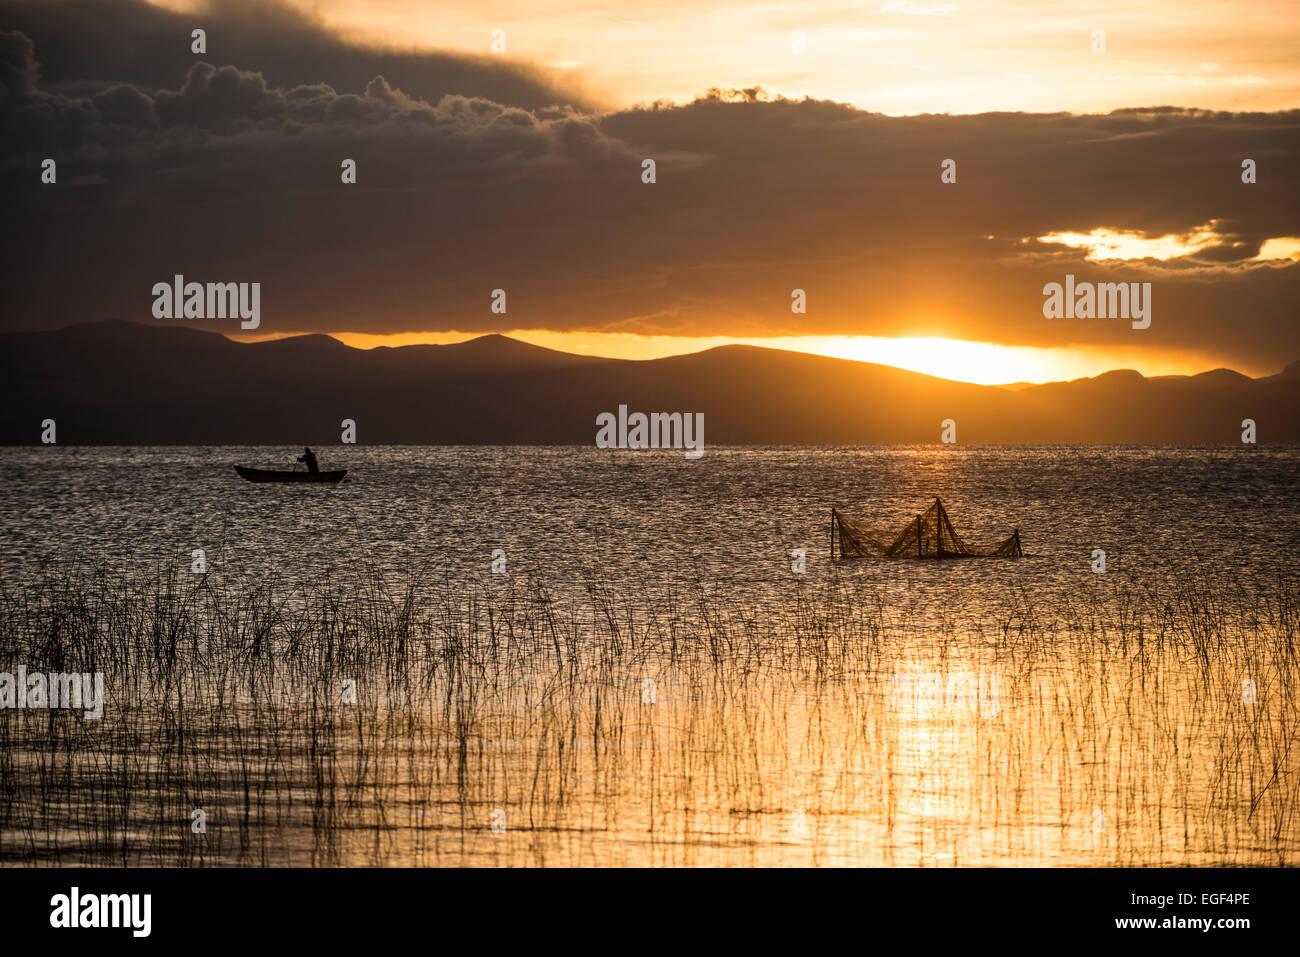 Sunset over Lake Titicaca, Copacabana, Lake Titicaca, Bolivia - Stock Image